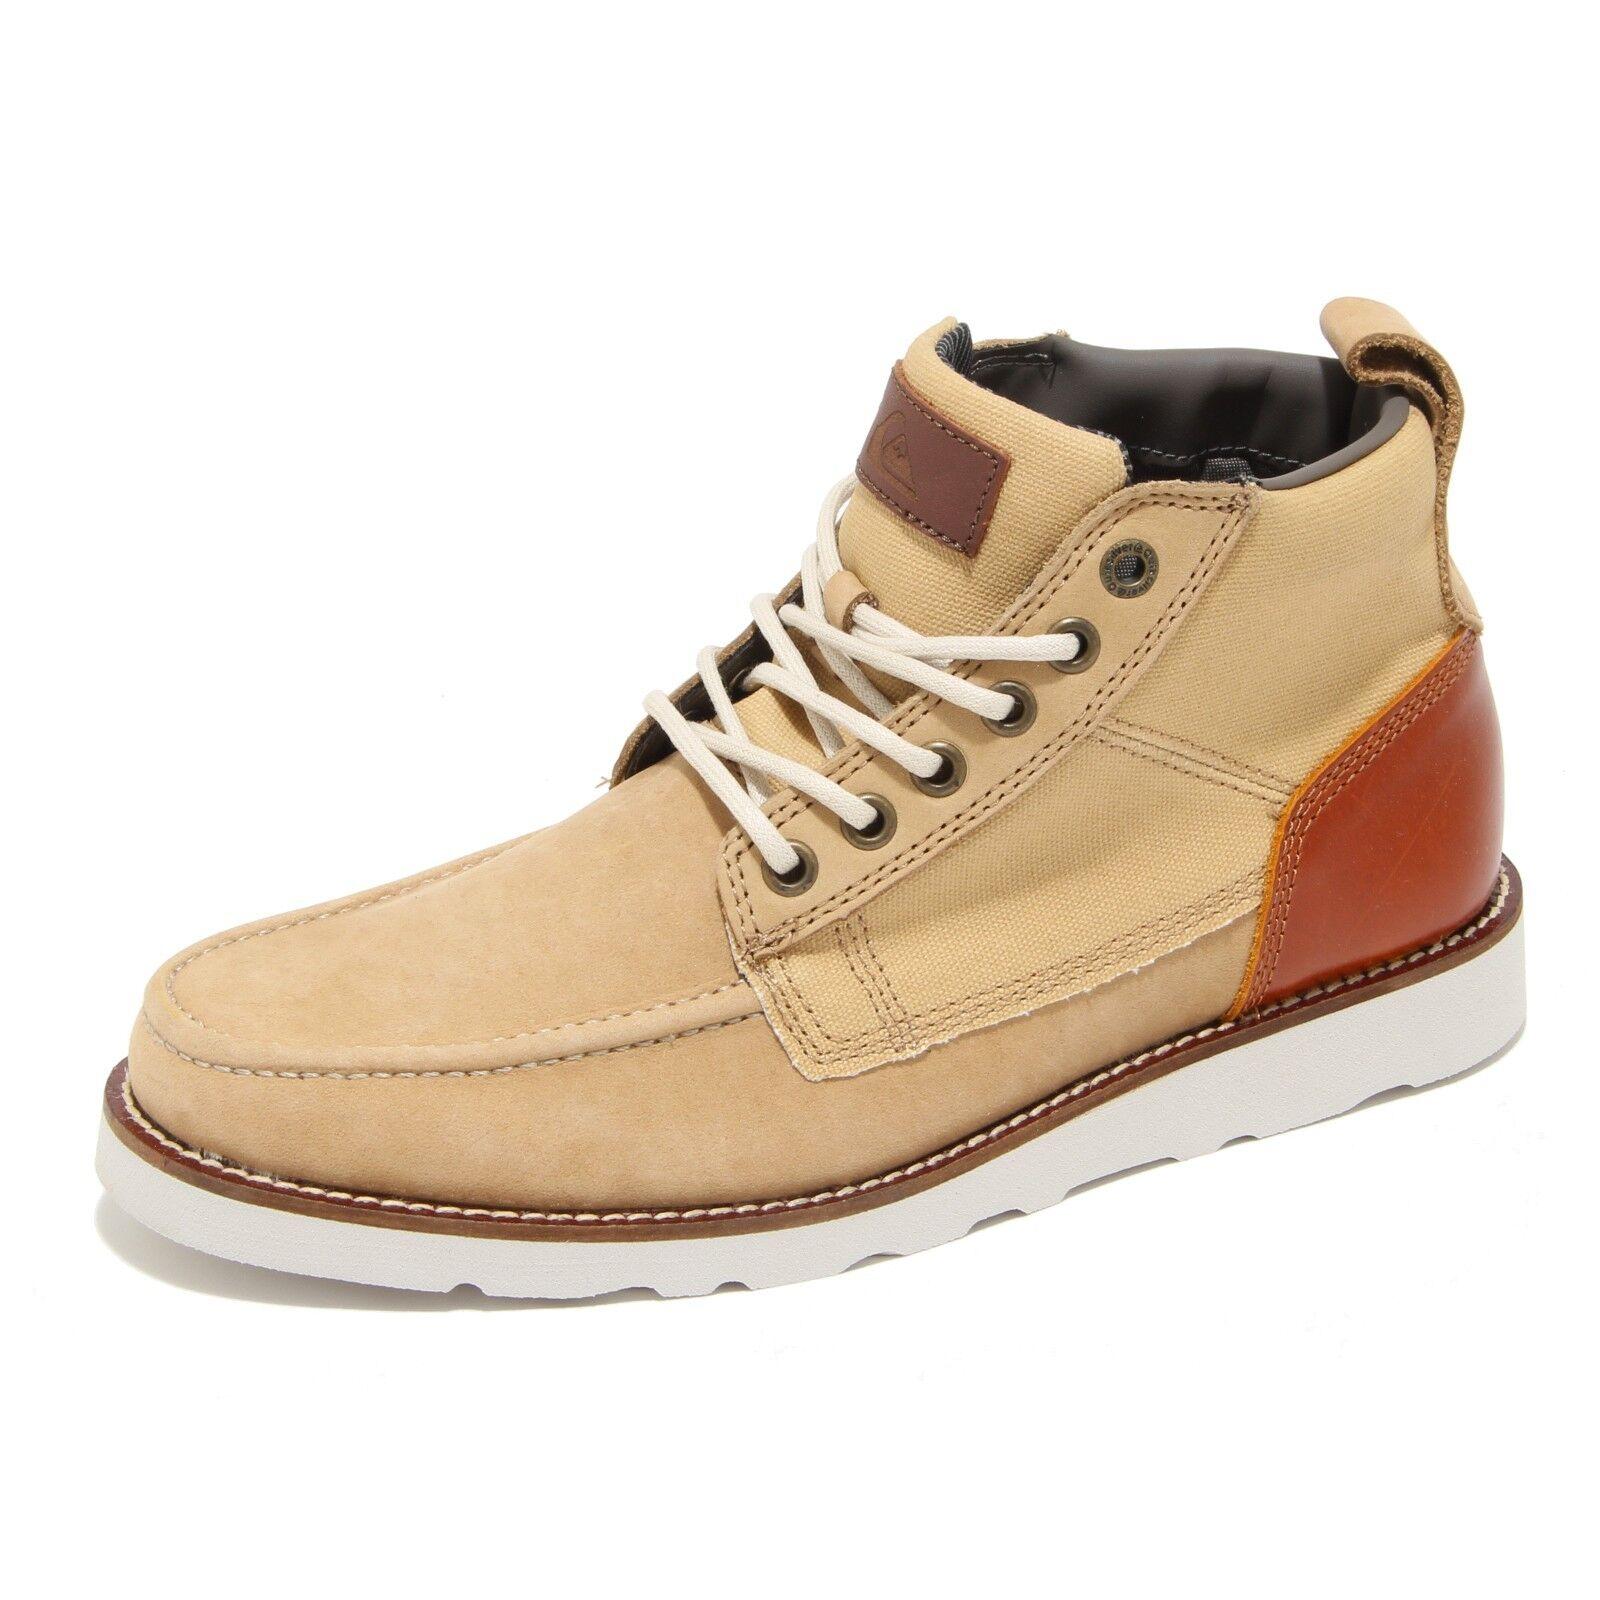 2588I sneakers uomo QUIKSILVER july scarpe shoes men